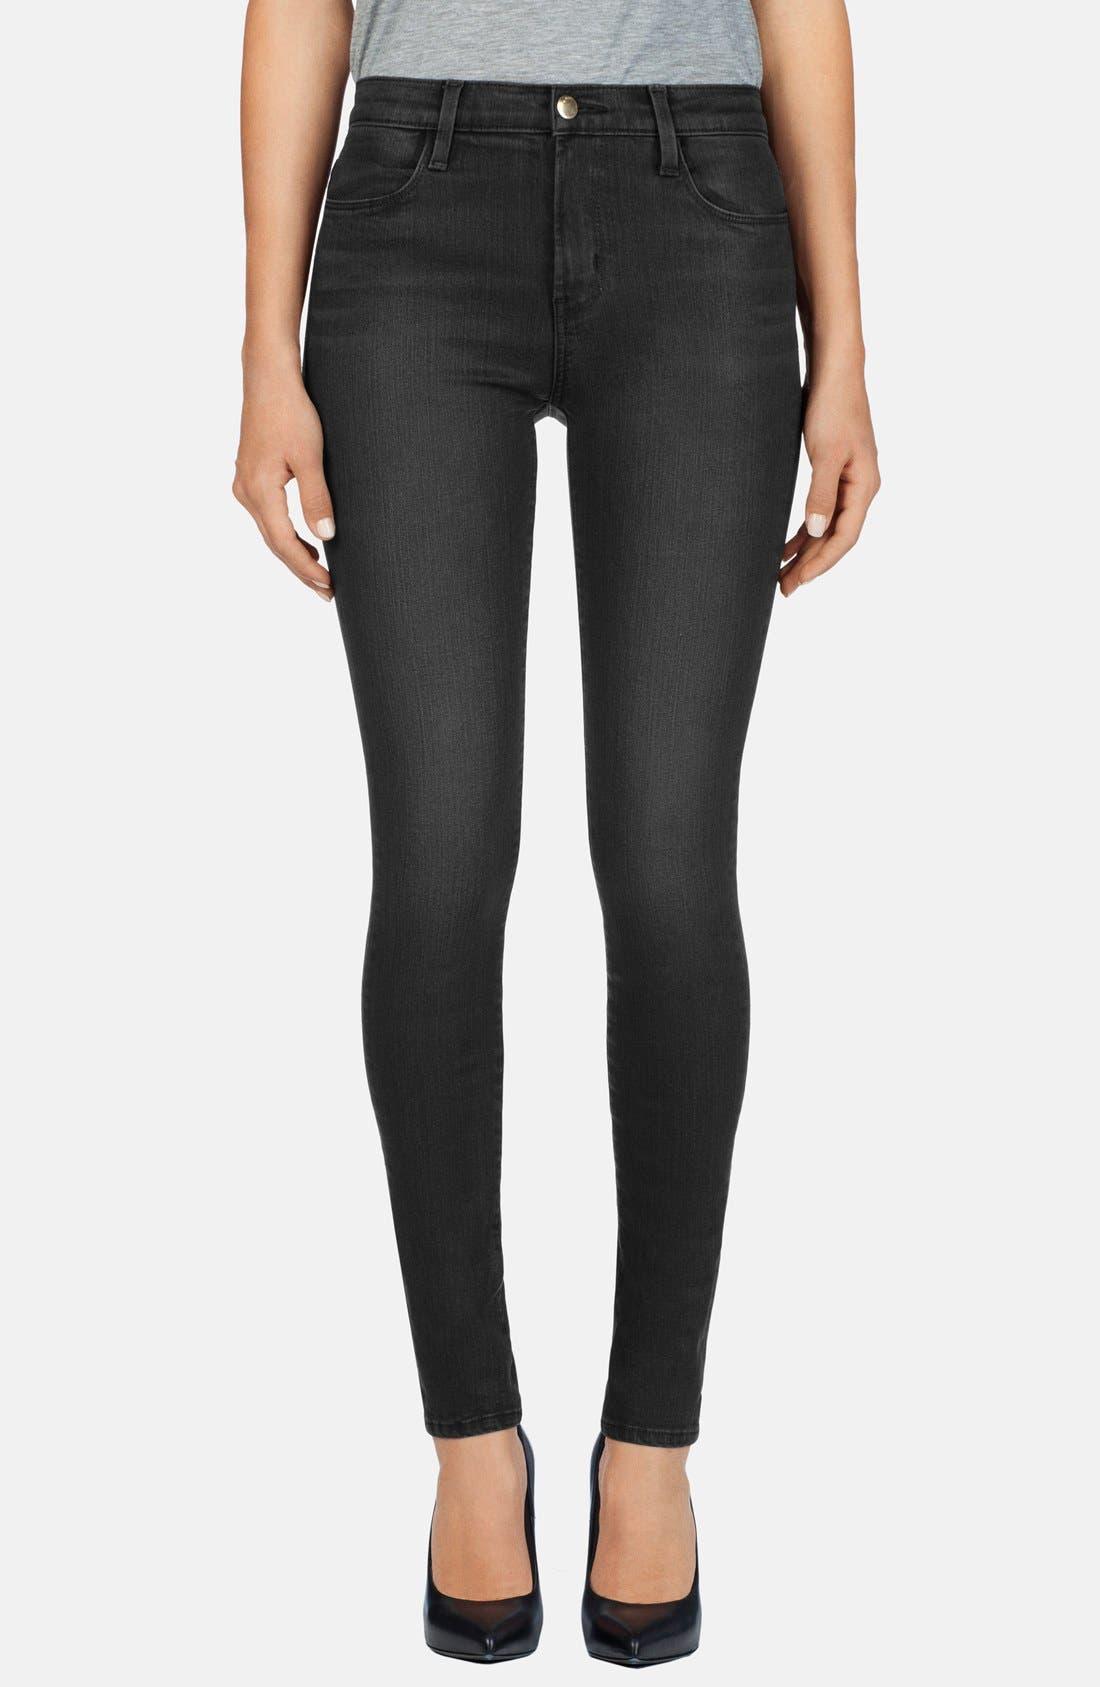 Main Image - J Brand '620' Mid Rise Skinny Jeans (Black Diamond)